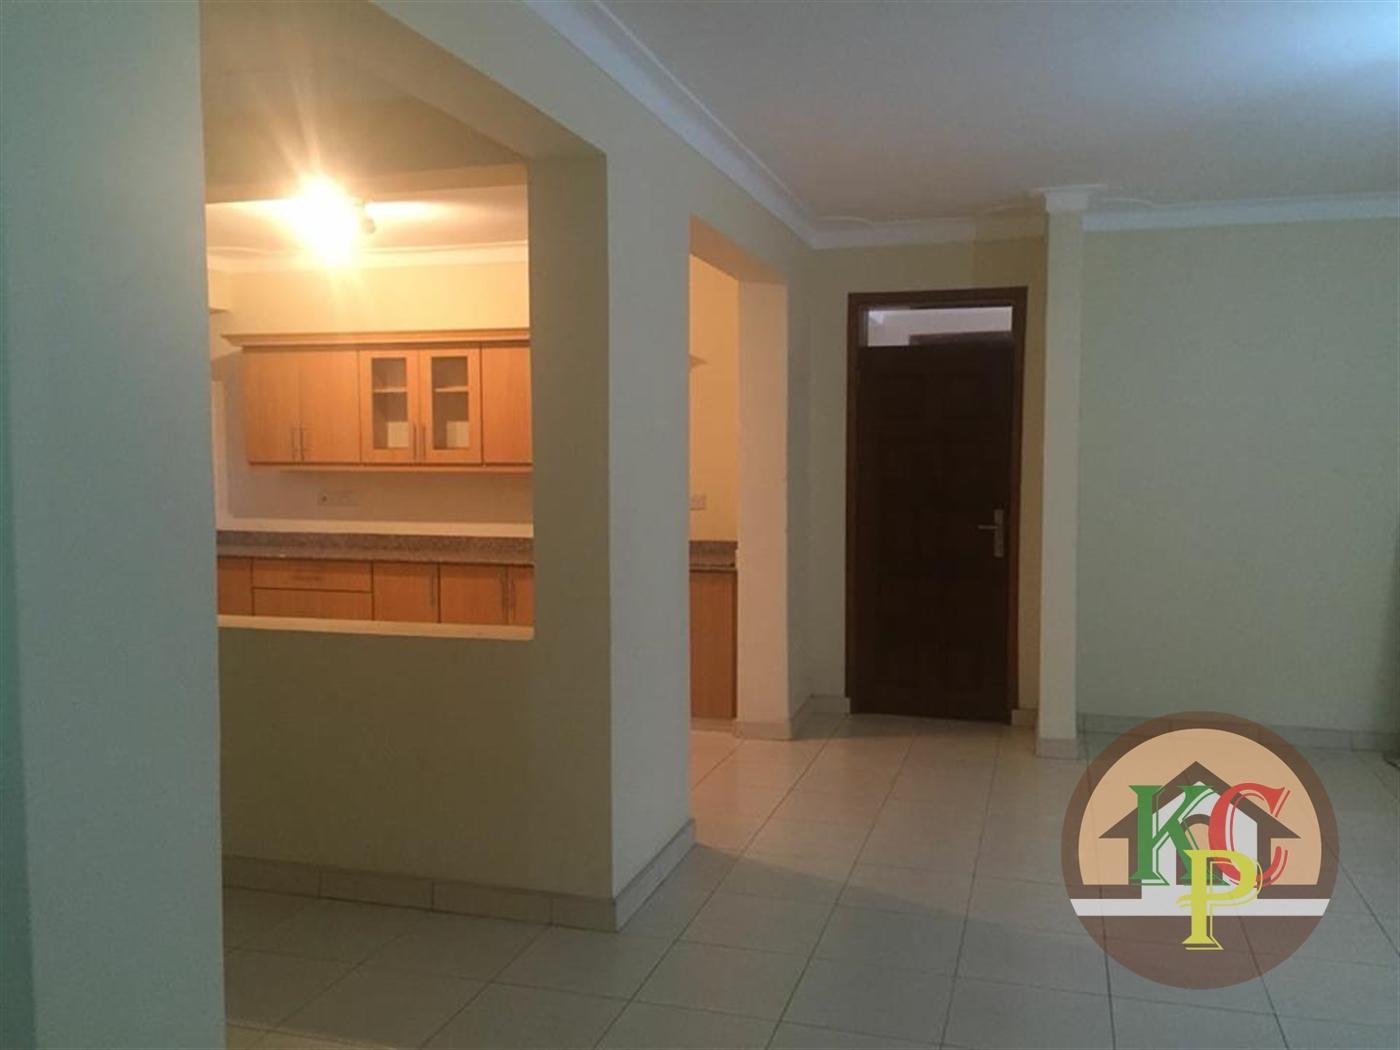 Apartment for rent in Kampala Kampala